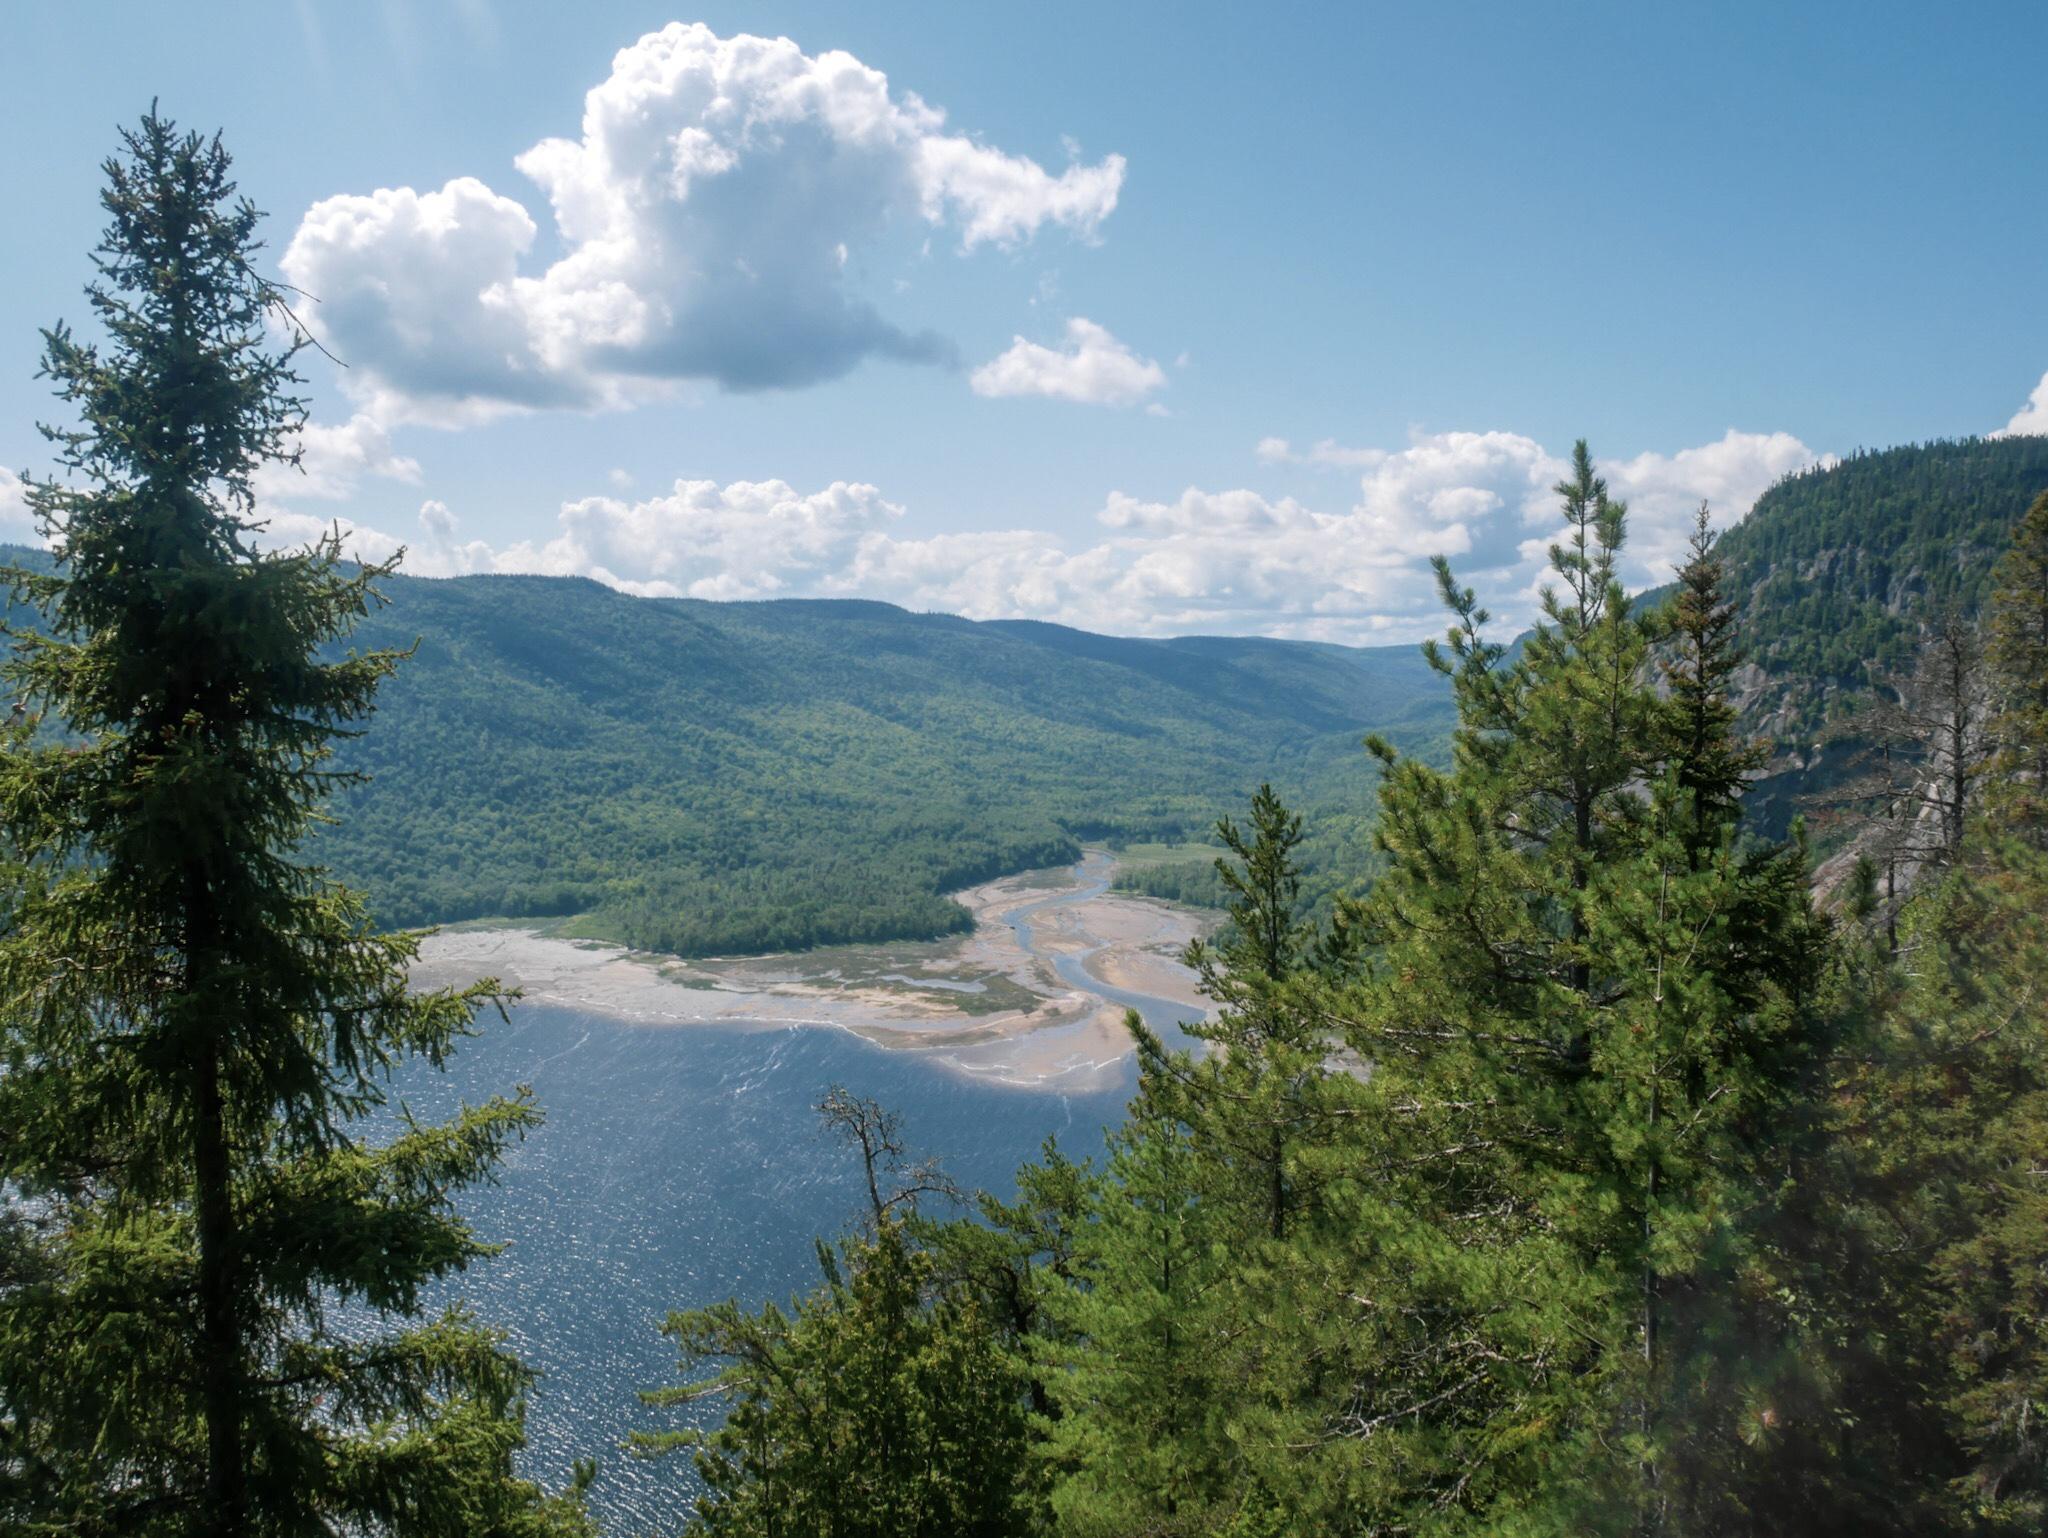 Halte Bienvenue au fjord de Saguenay - Roadtrip au Québec, Canada - Blog Voyage MA Folie Vagabonde